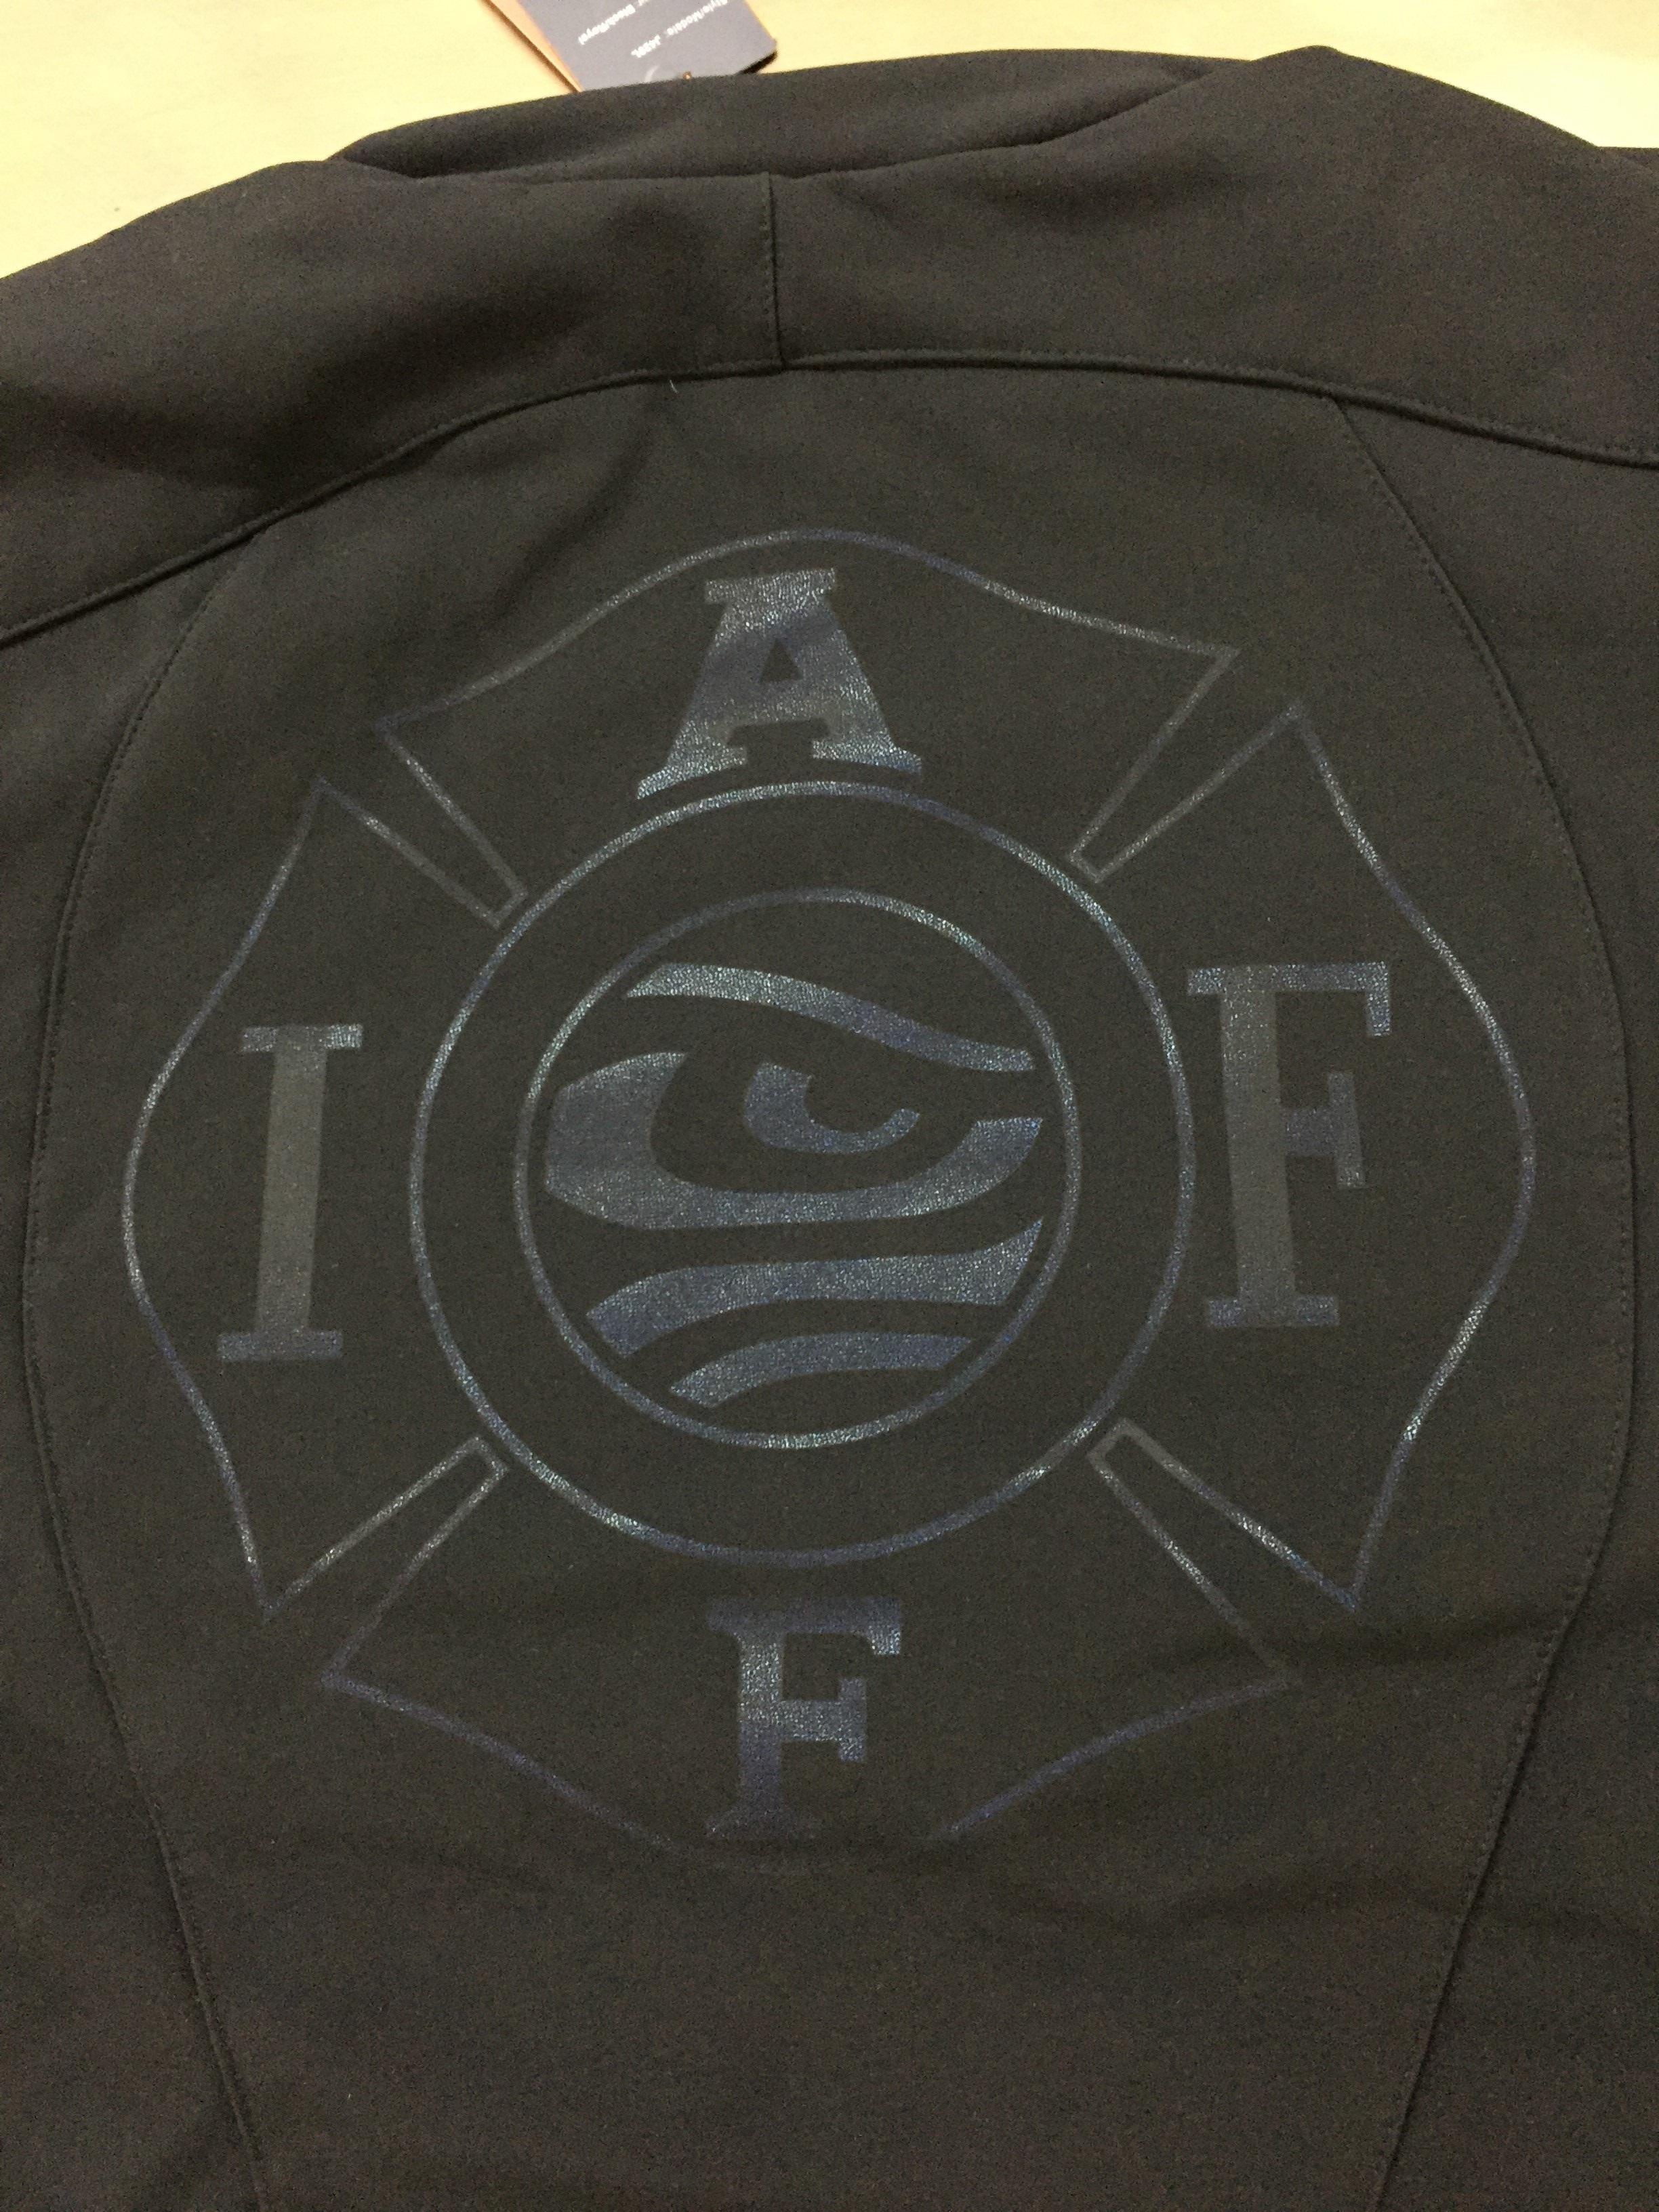 logounltd_laser_etching_embroidery_screen_printing_apparel_uniform_custom_tshirts_dye_sublimation_kirkland_bellevue_seattle_redmond_branded_merchandise_promotional_products_logo_unltd_l27_firefighters.jpg